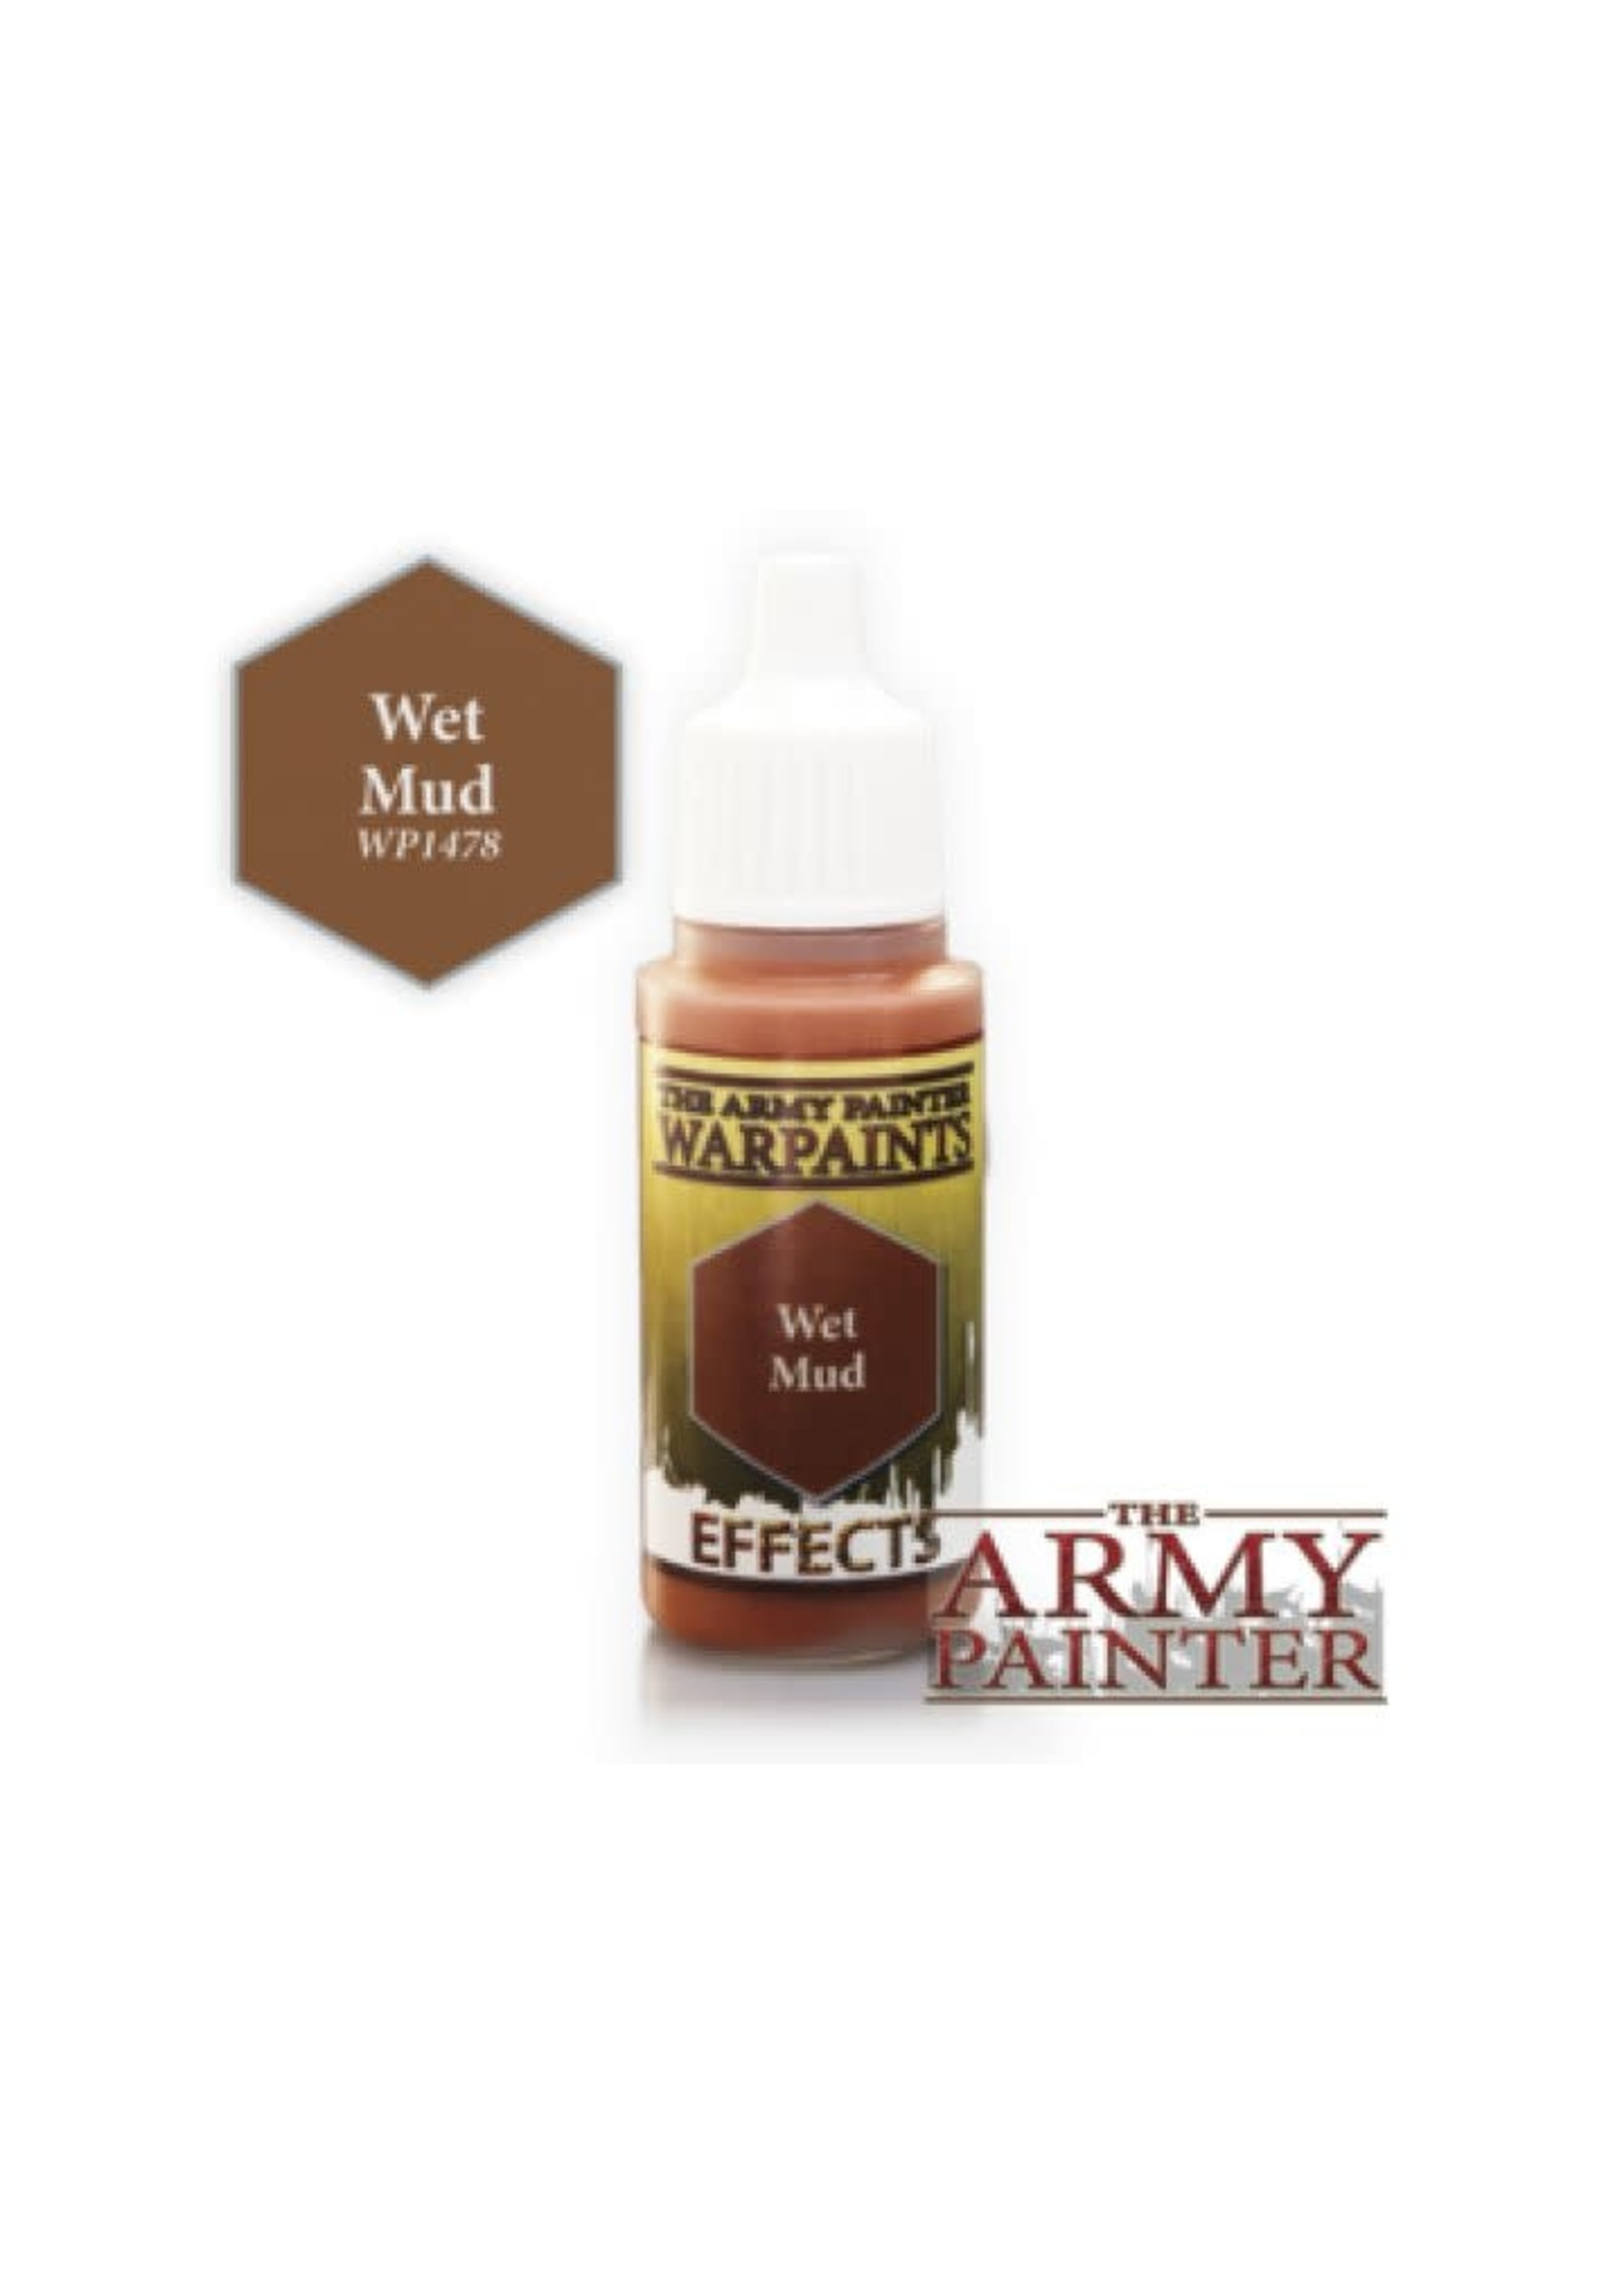 Army Painter Warpaints - Wet Mud